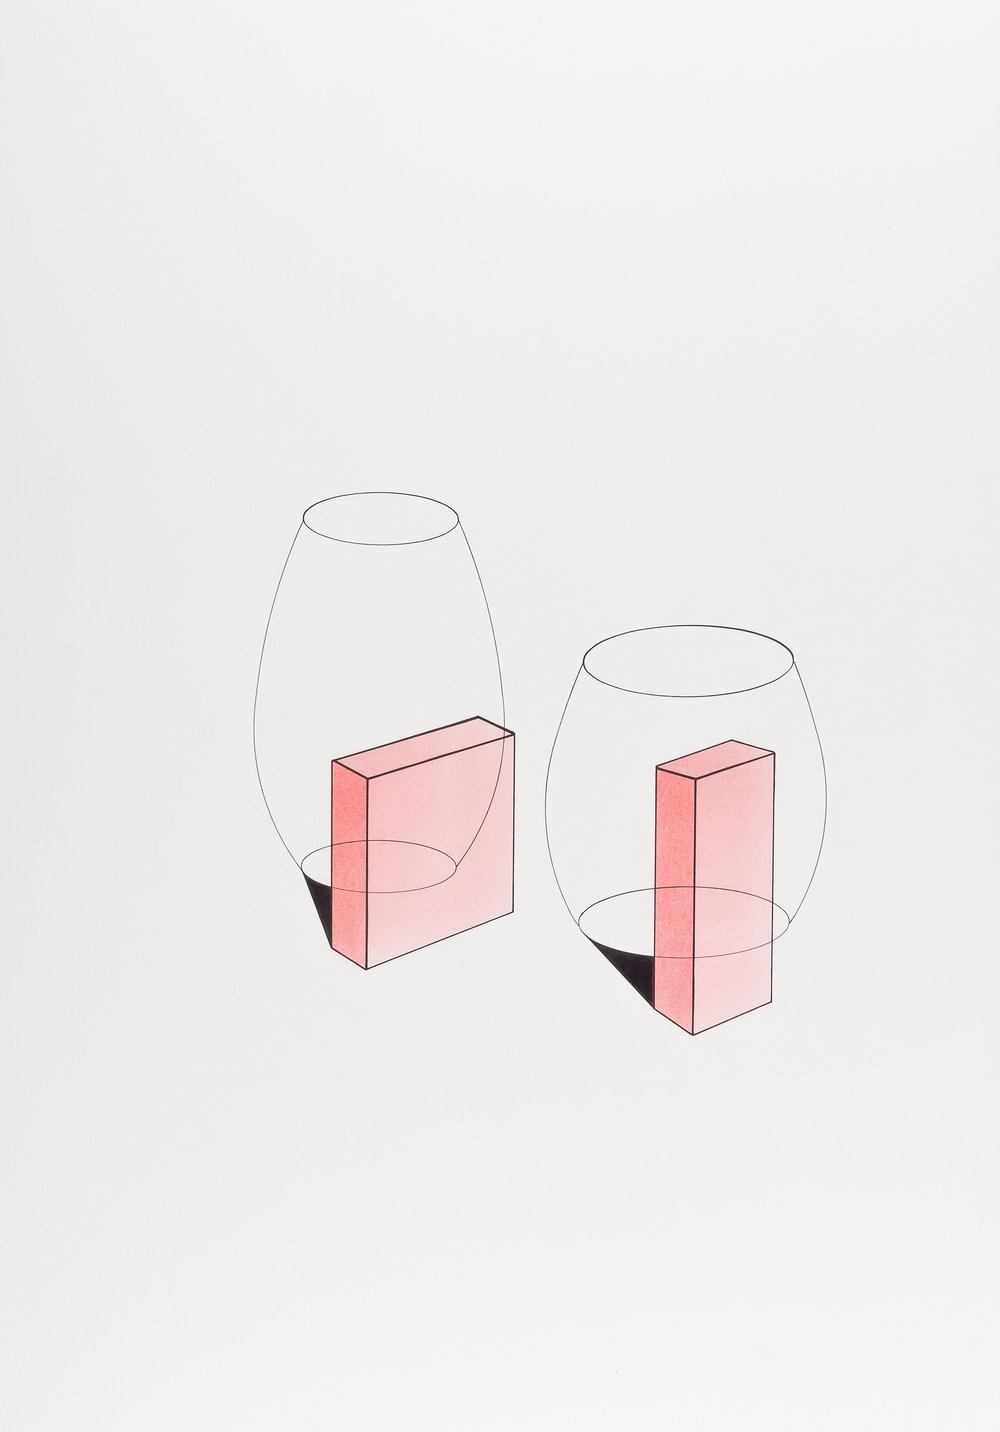 Galeria Raquel Arnaud. Waltercio Caldas, Untitled.  2012